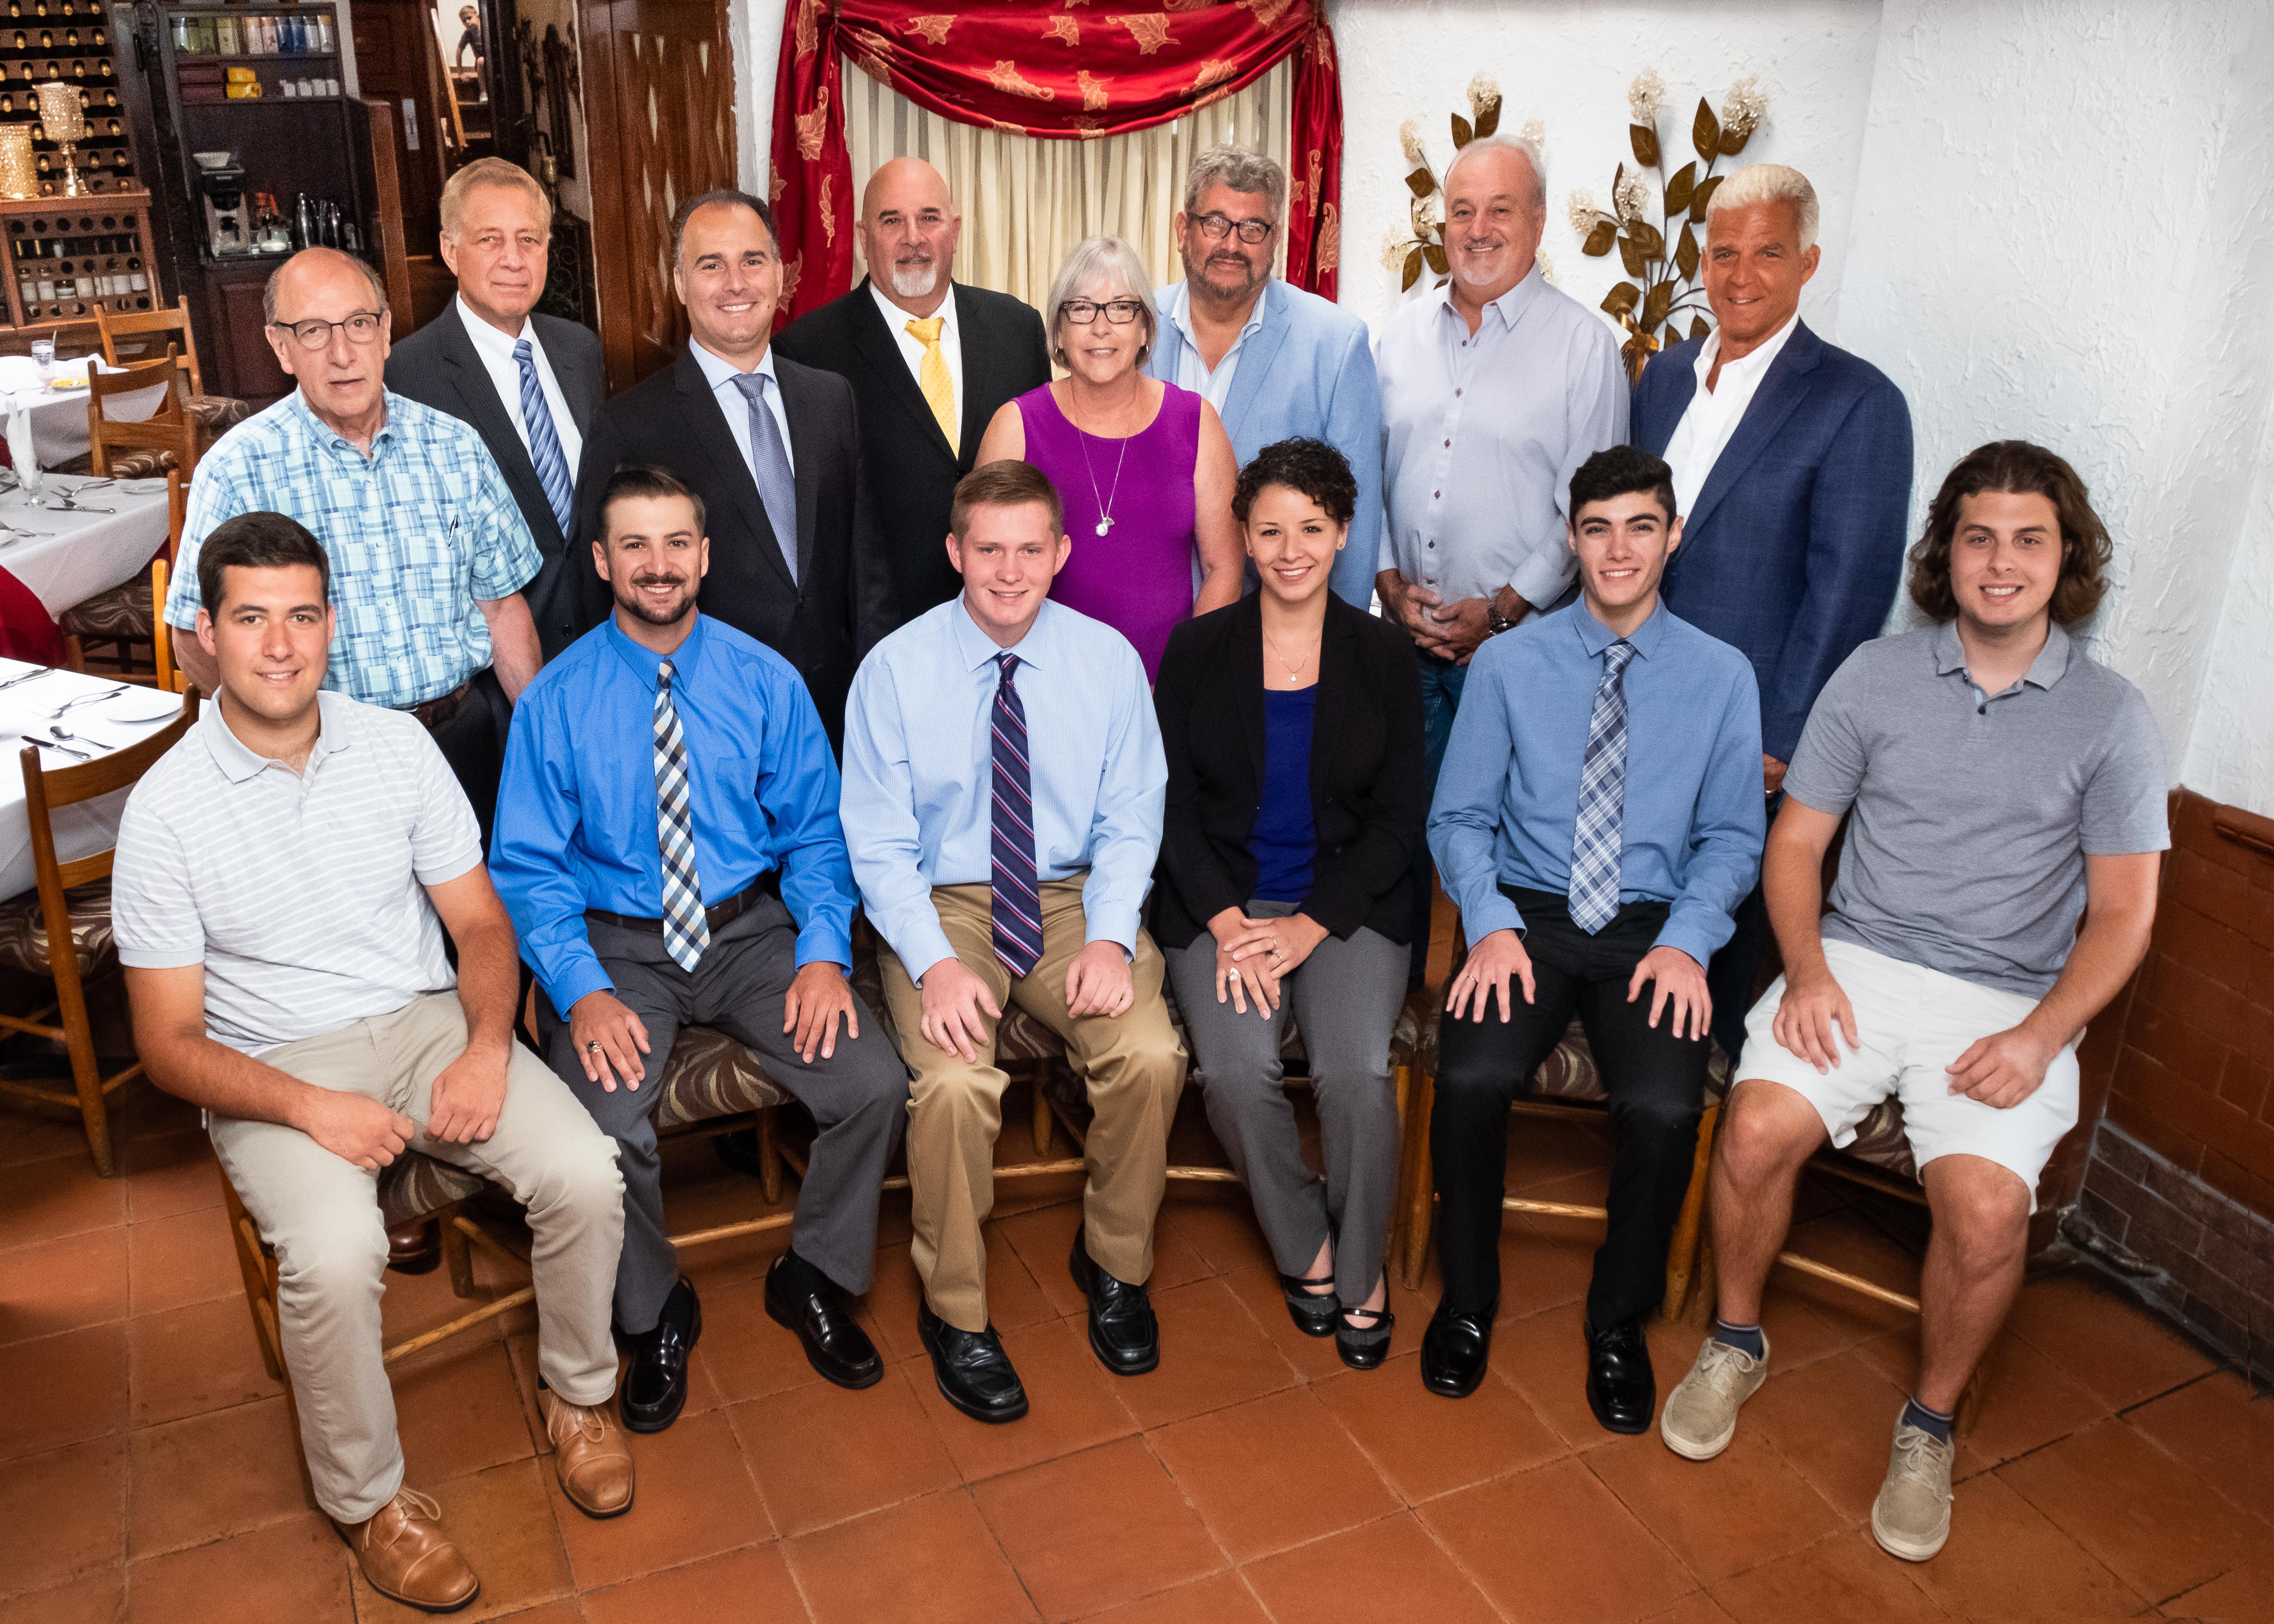 Scholarships for senior citizens returning to college